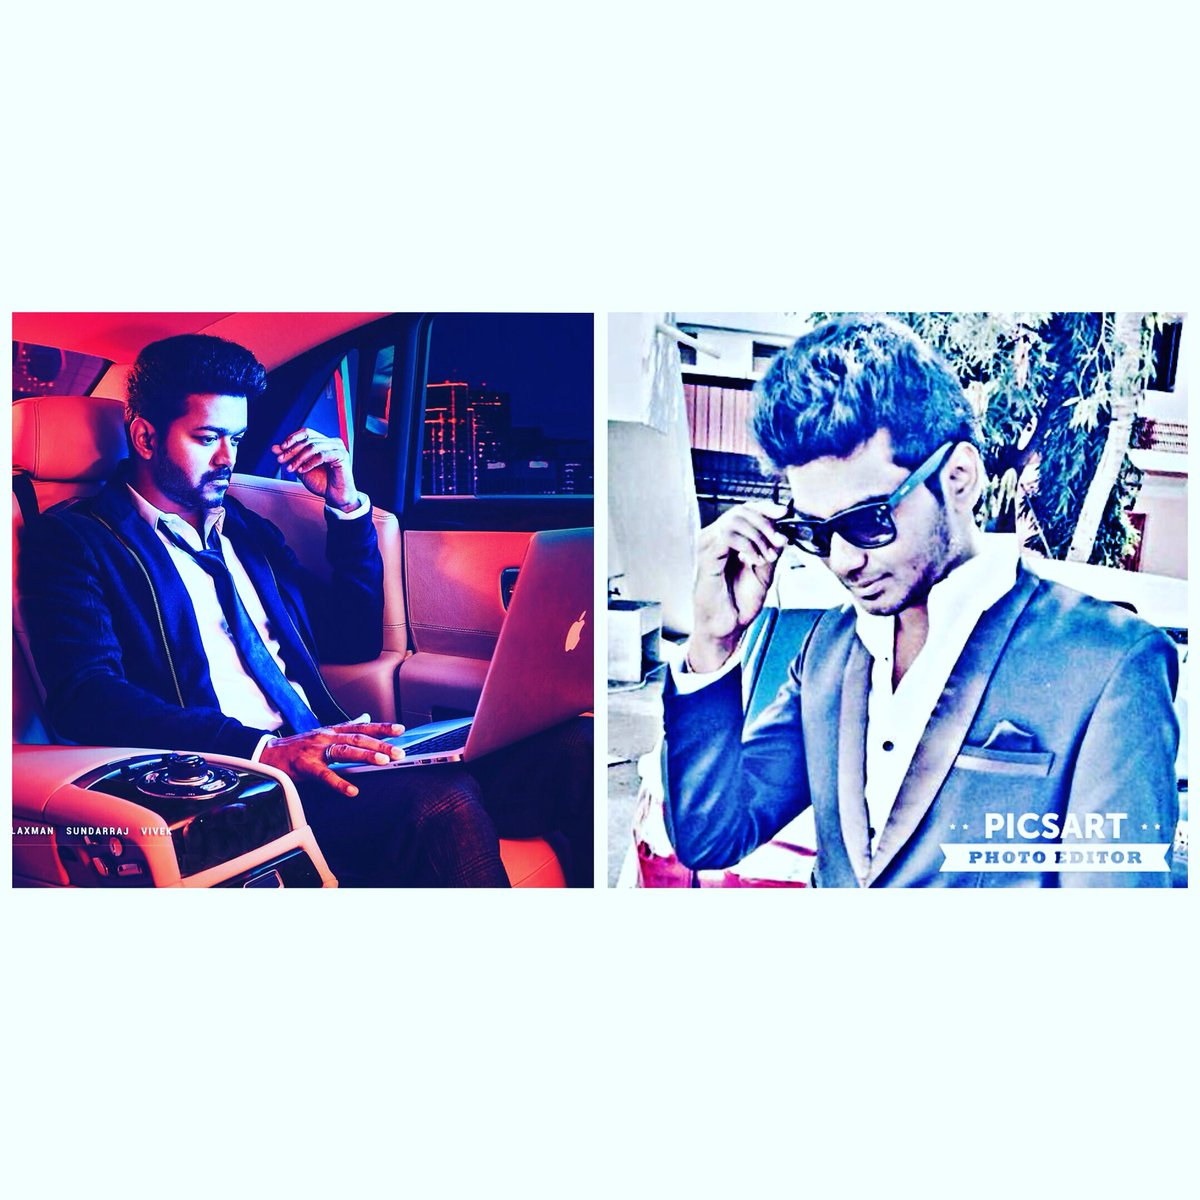 Craze for vijay 😂😂😍😍😍